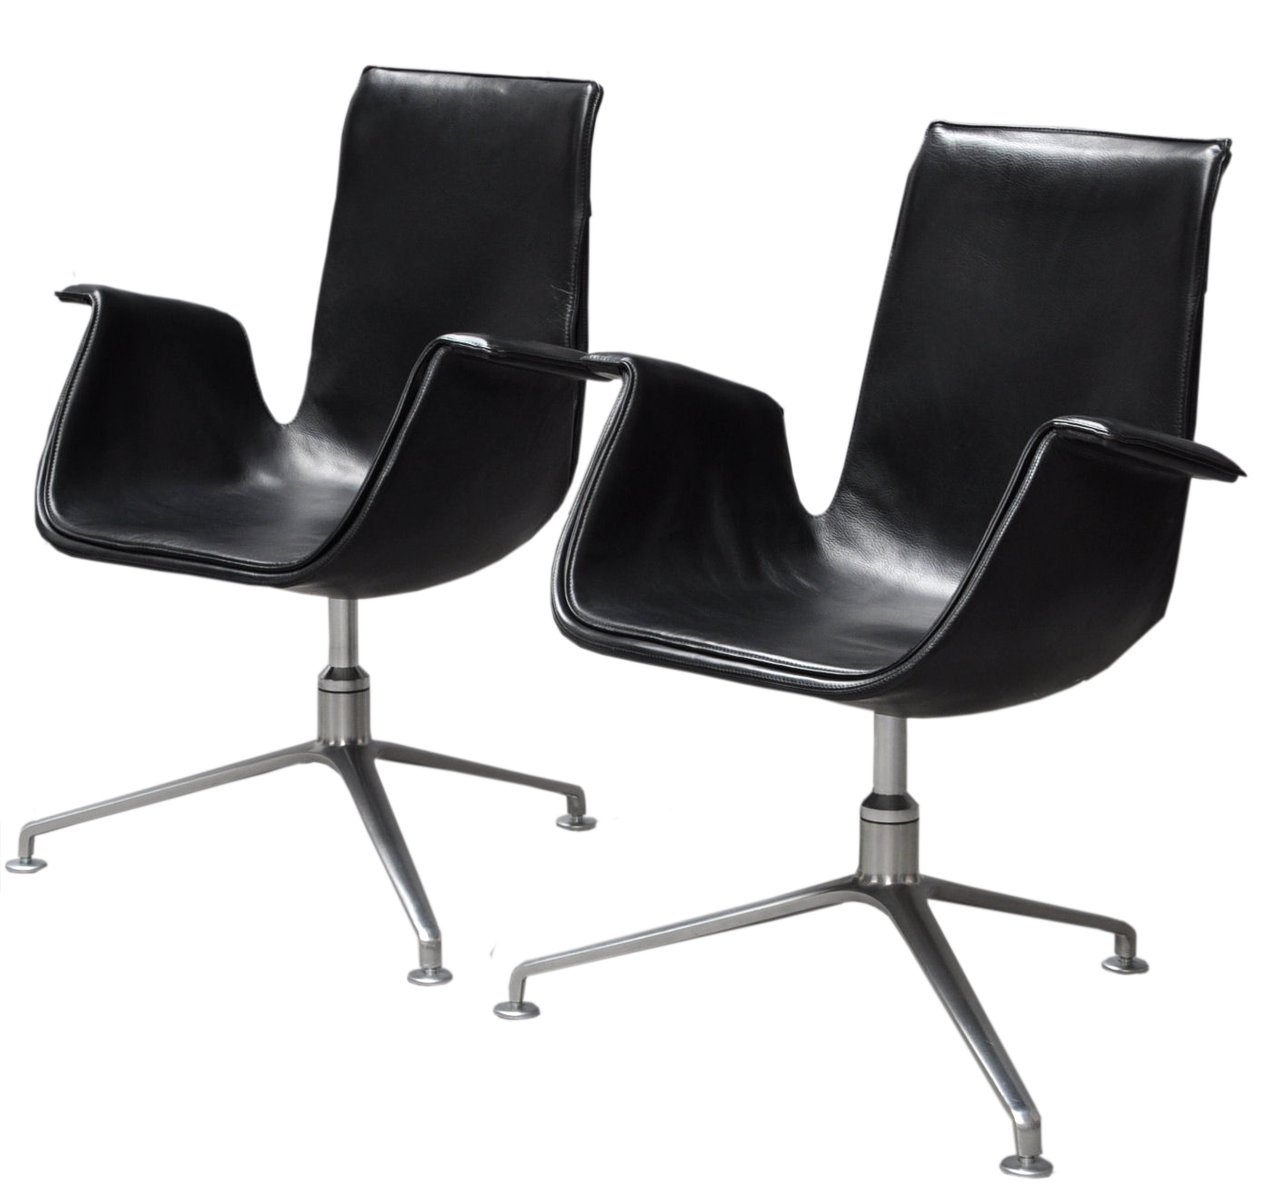 Model 6727 Tulip Chair By Preben Fabricius U0026 Jørgen Kastholm For Walter  Knoll, 1950s